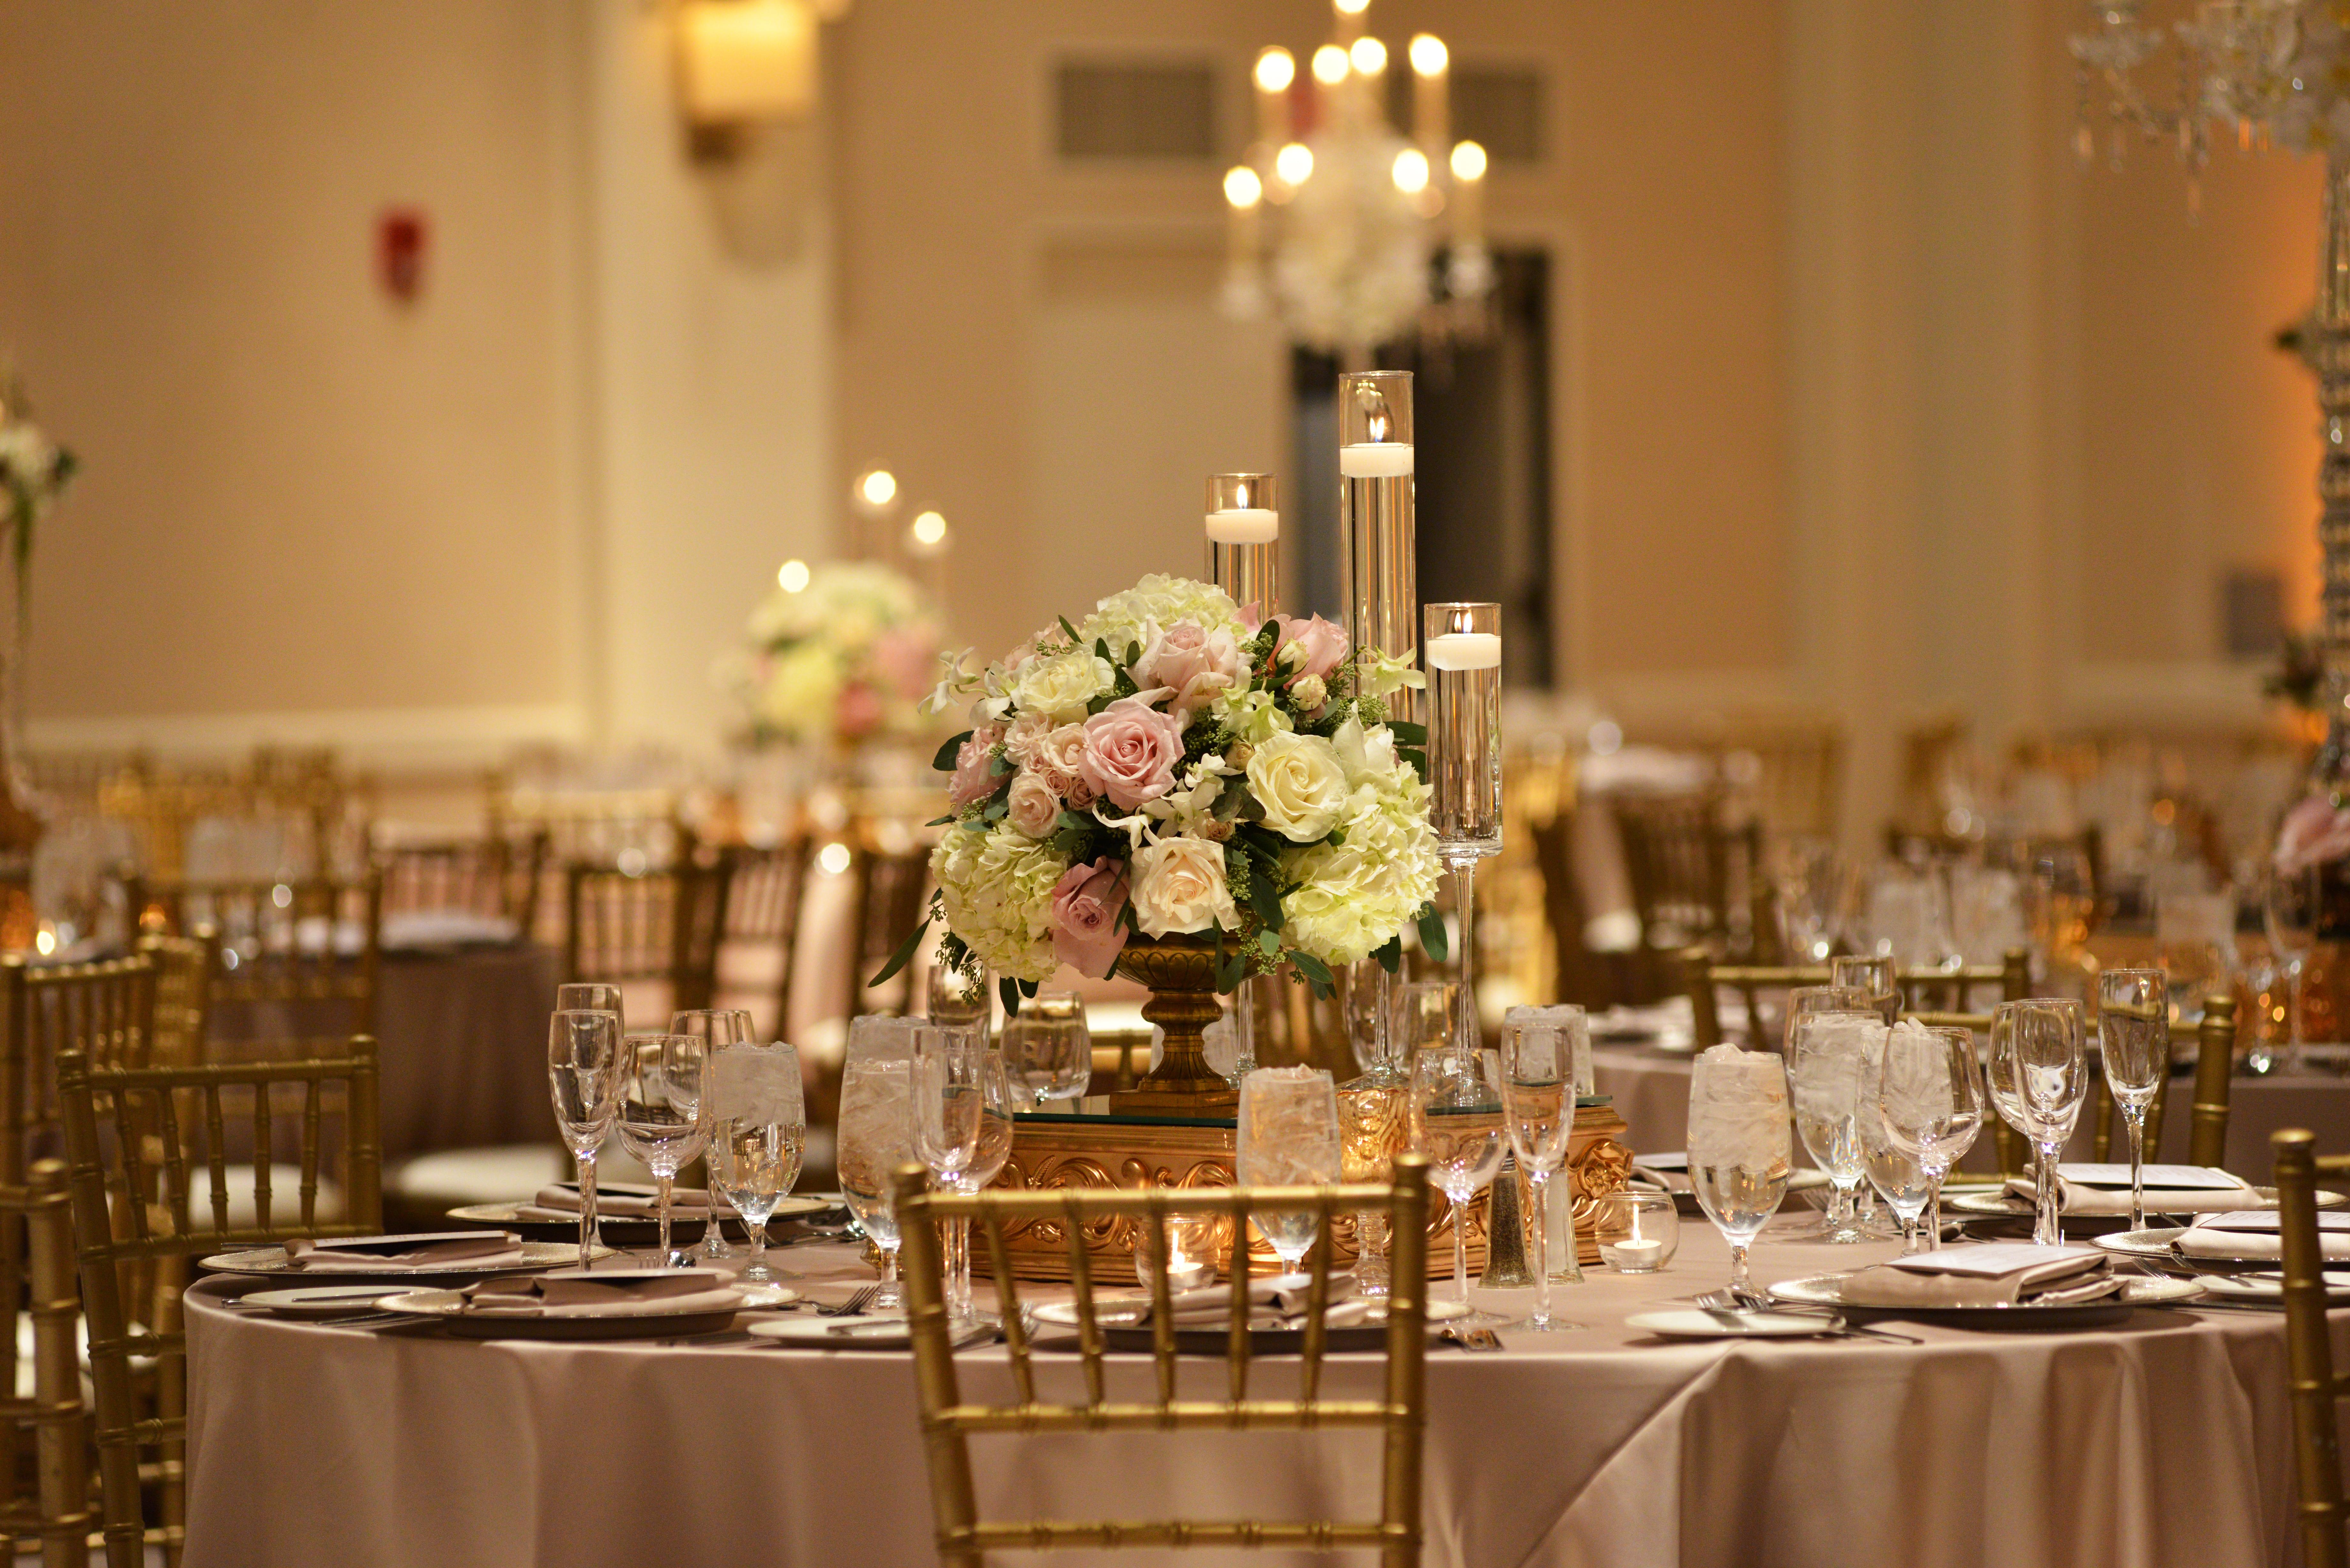 Elegant Gold Chandeliers and Fresh Floral - Yanni Design Studio